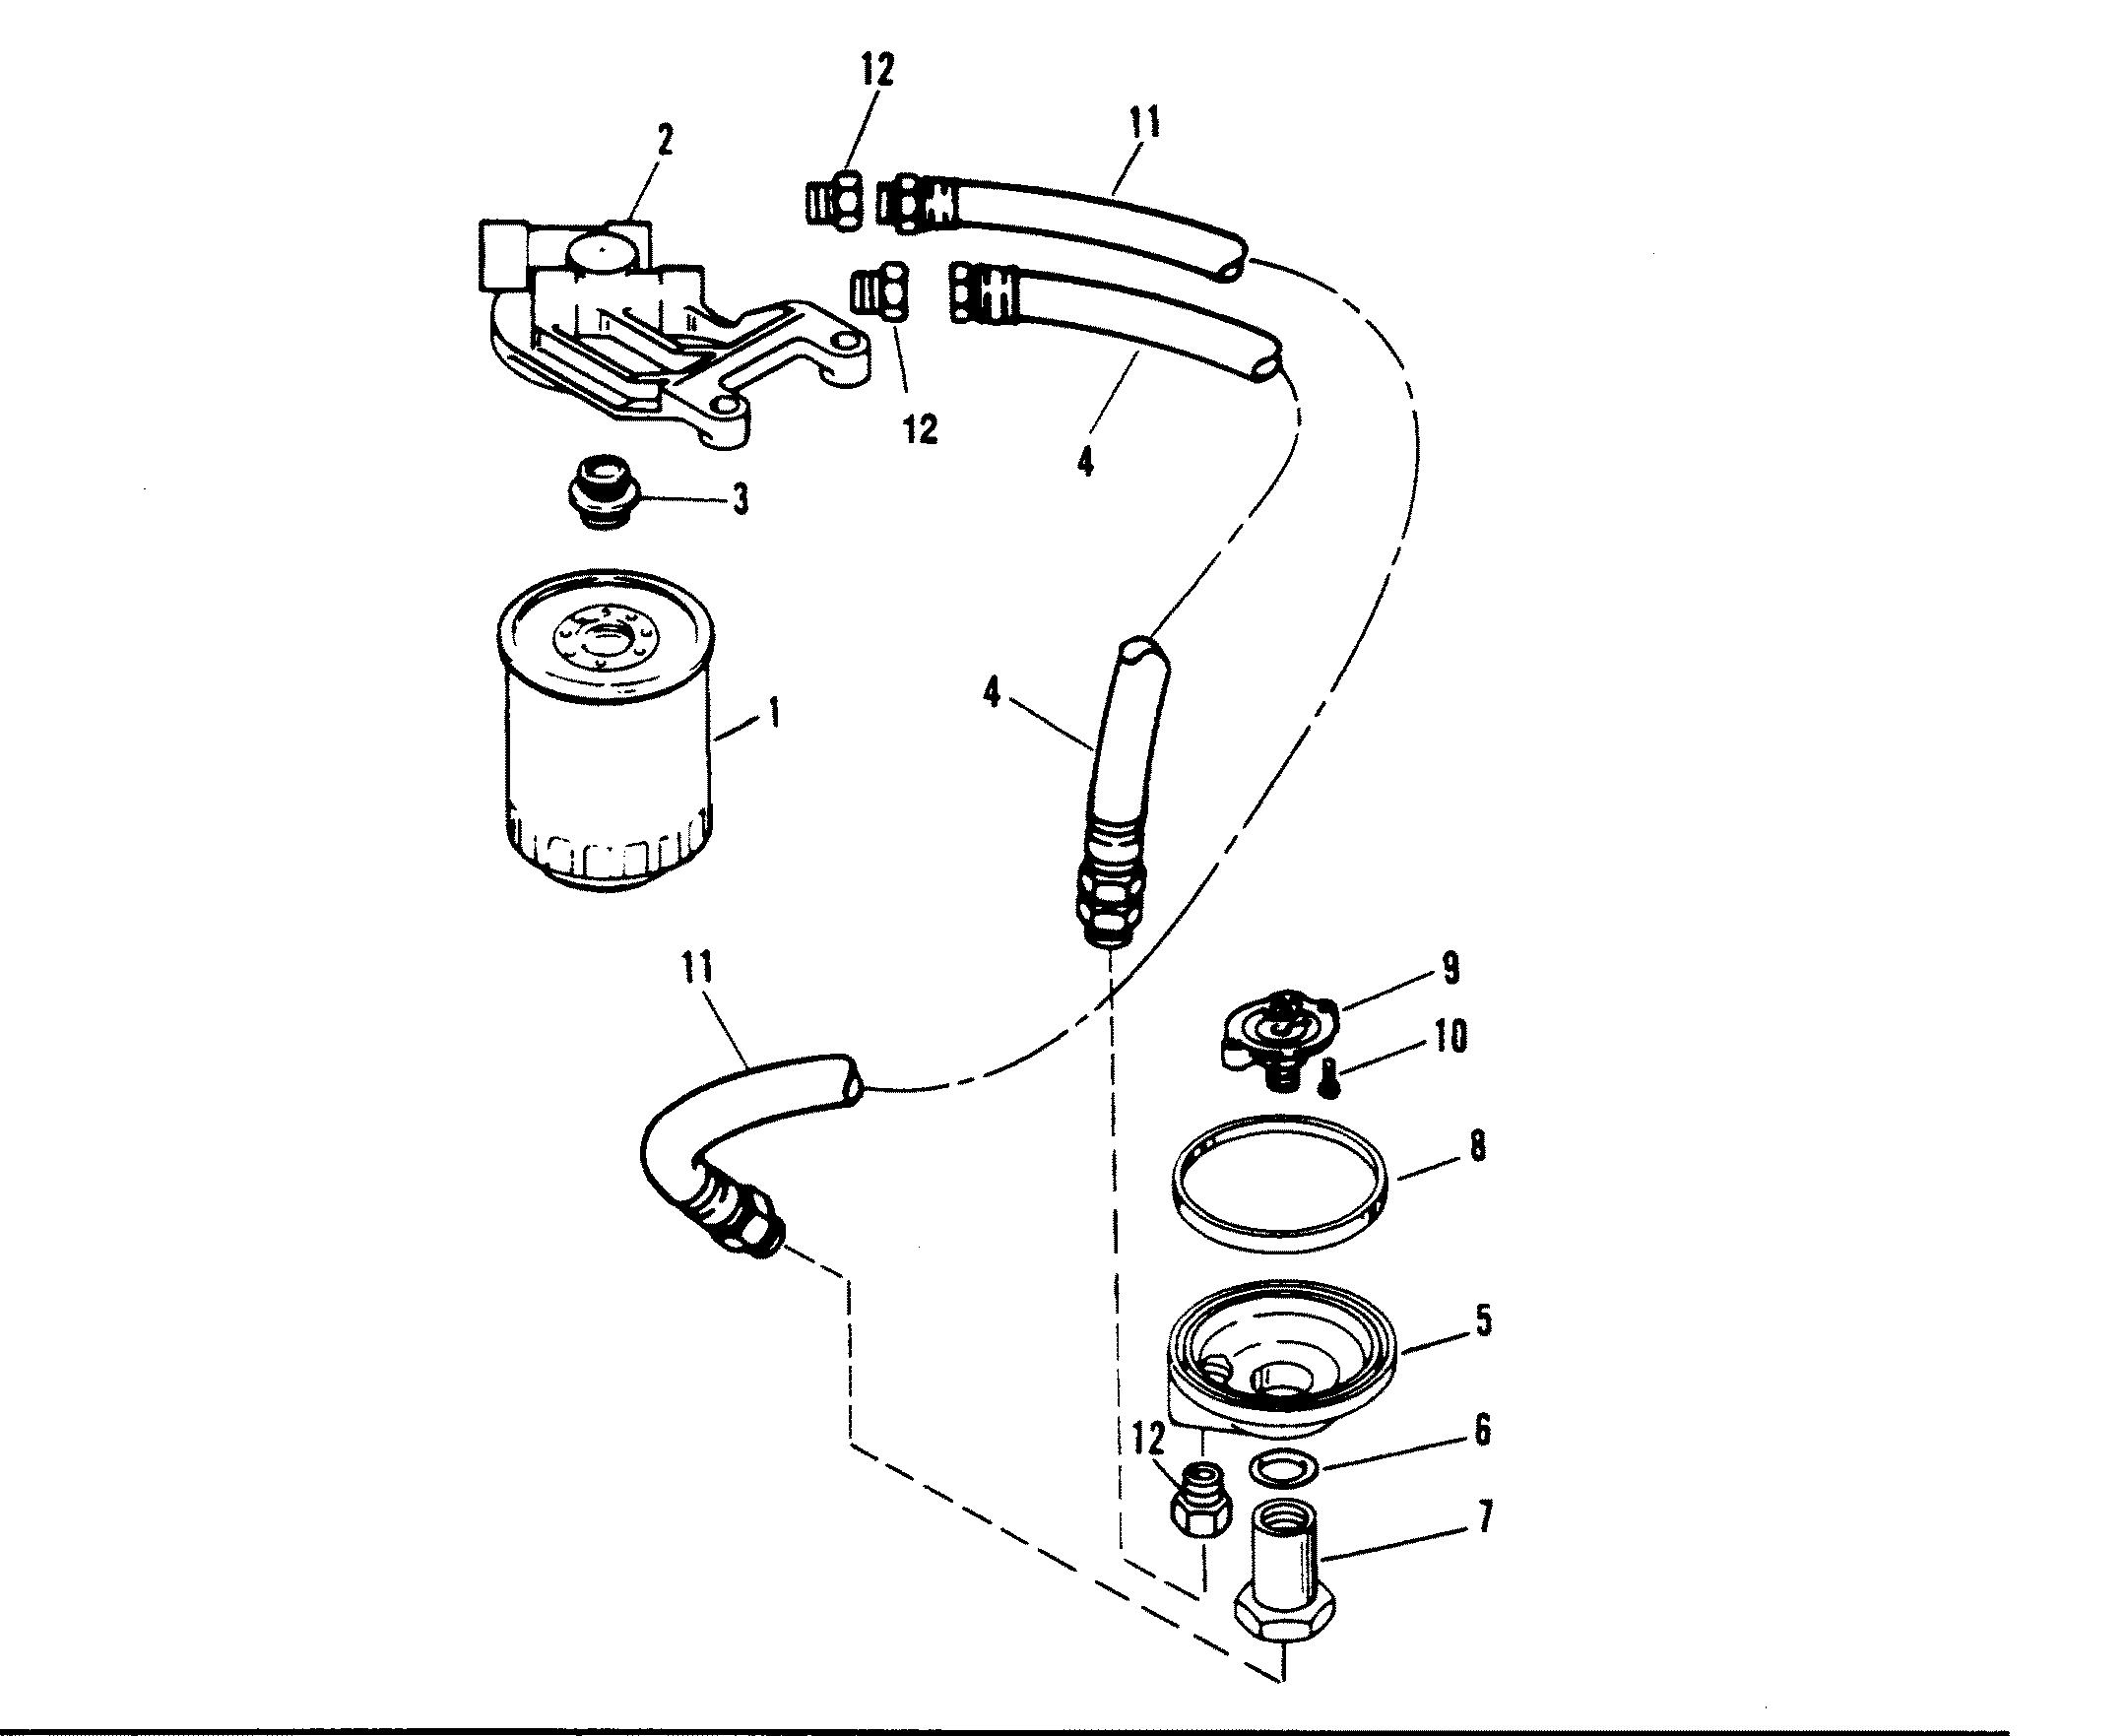 Oil Filter And Adaptor For Mercruiser 5 7l Alpha Efi Tbi 5 7l Bravo Efi Tbi Engine